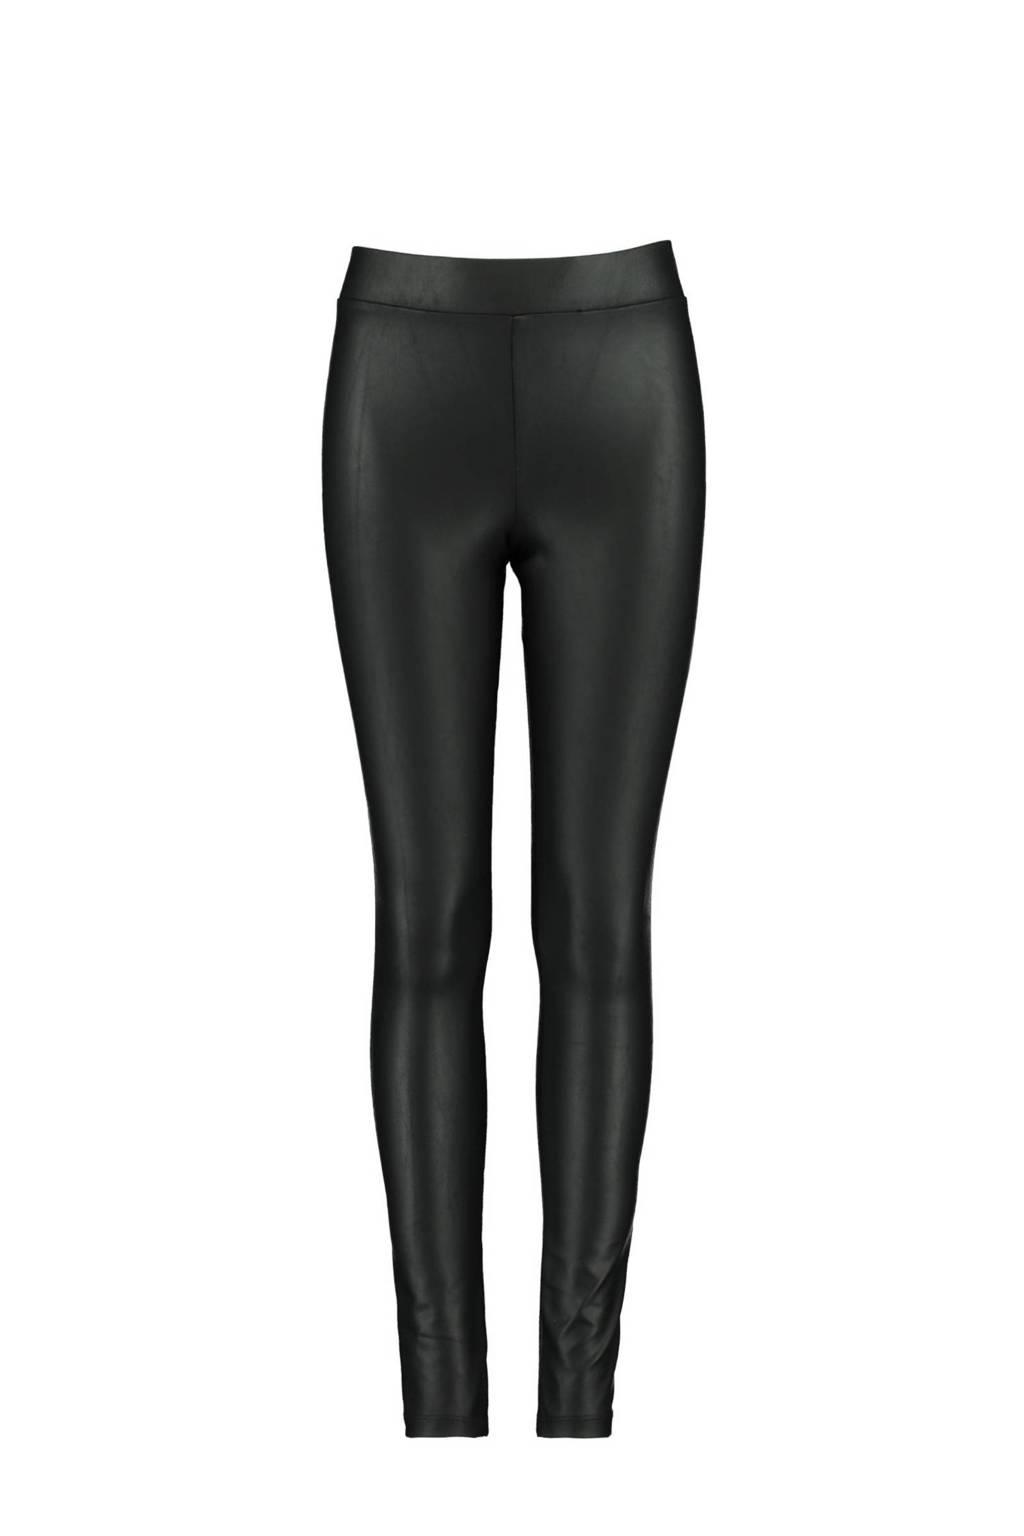 CoolCat Junior gecoate legging zwart, Zwart